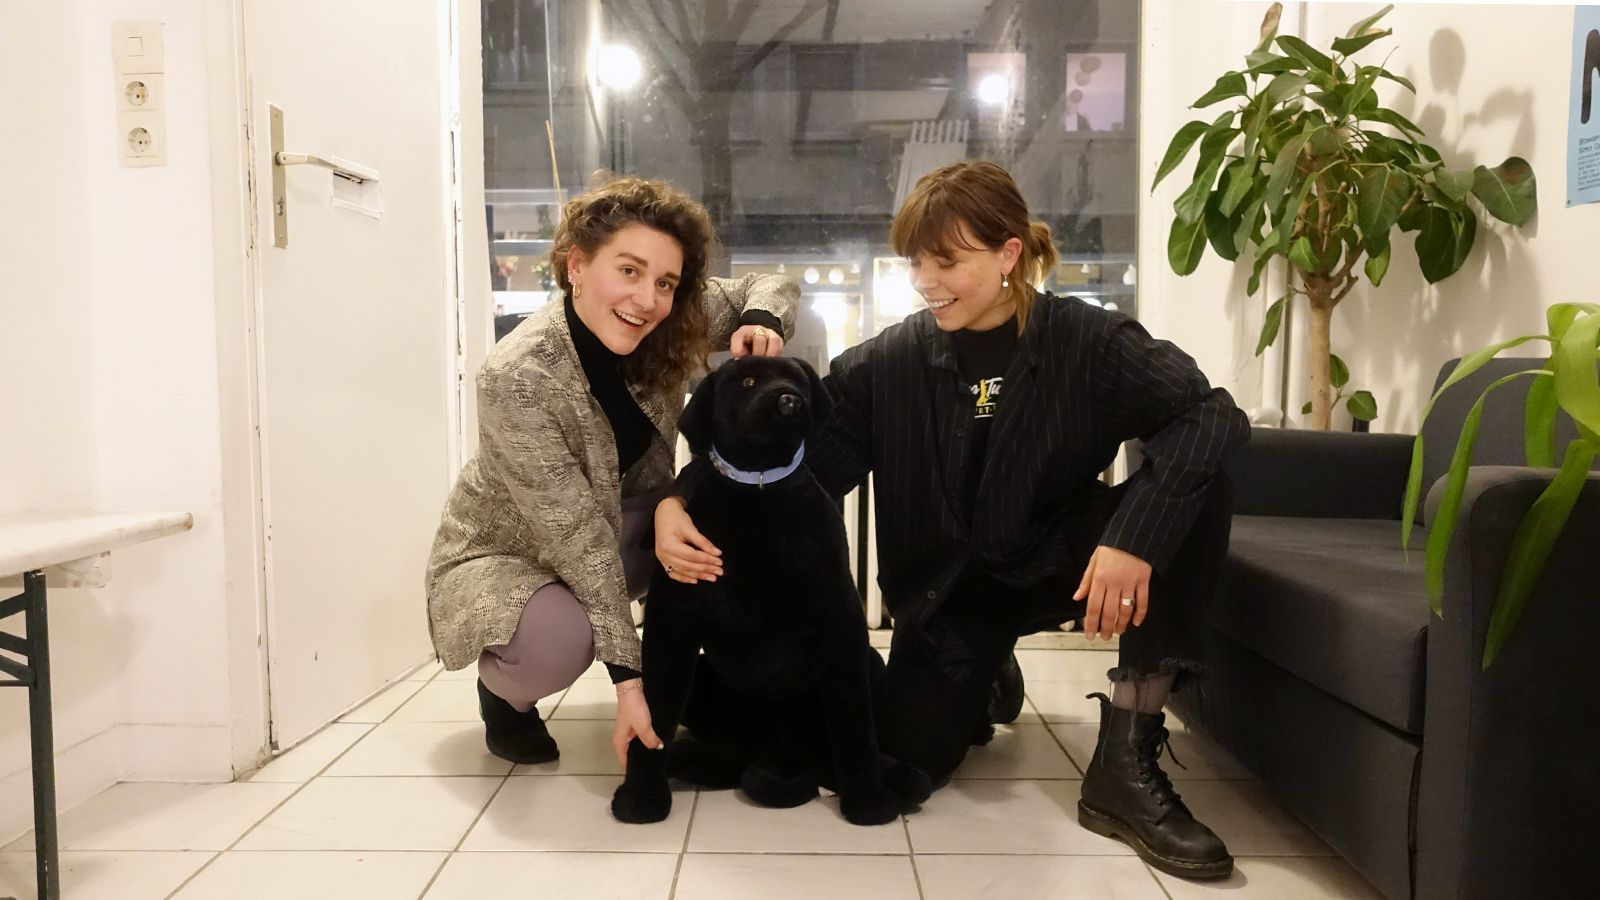 Kleiderei Radio w/ Amelie Liebst, Anna Burst, Ann Cathrin Schönrock & Franziska Uhl (February 2021)